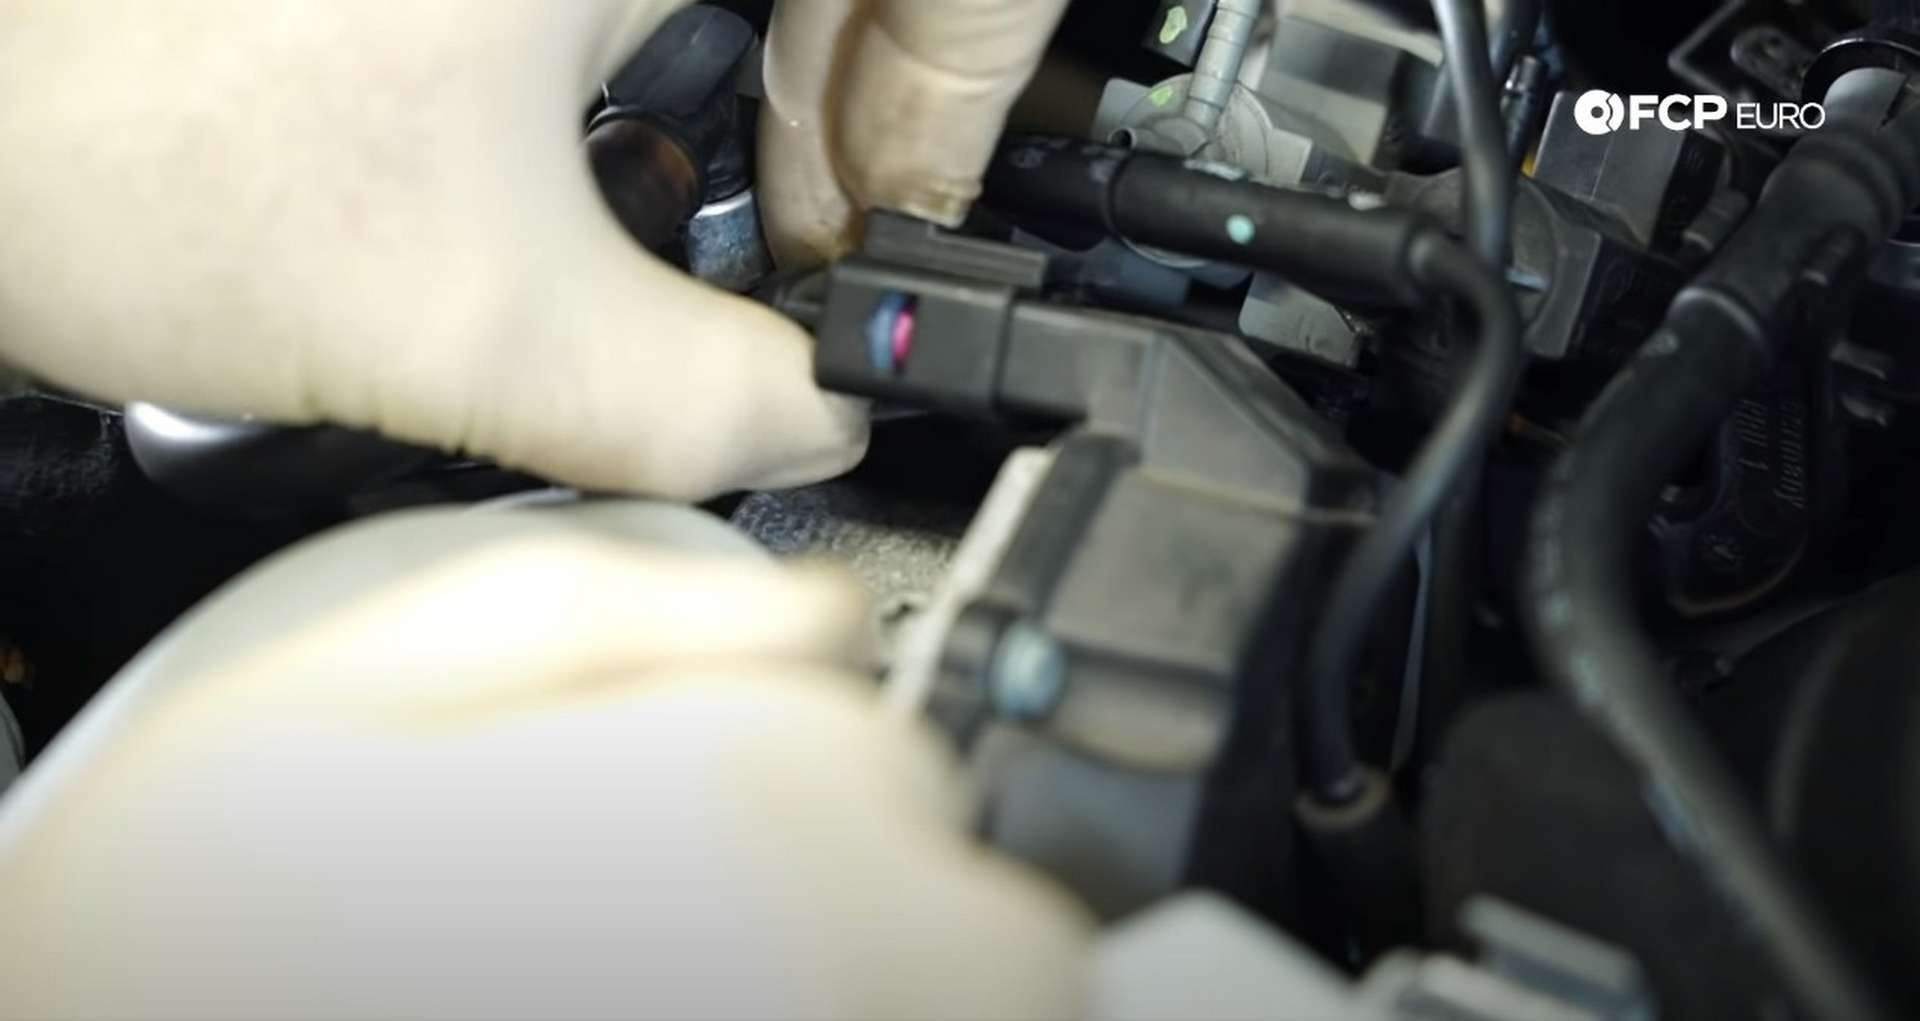 DIY Audi 3.0t Walnut Blasting Intake Valves unplugging connections